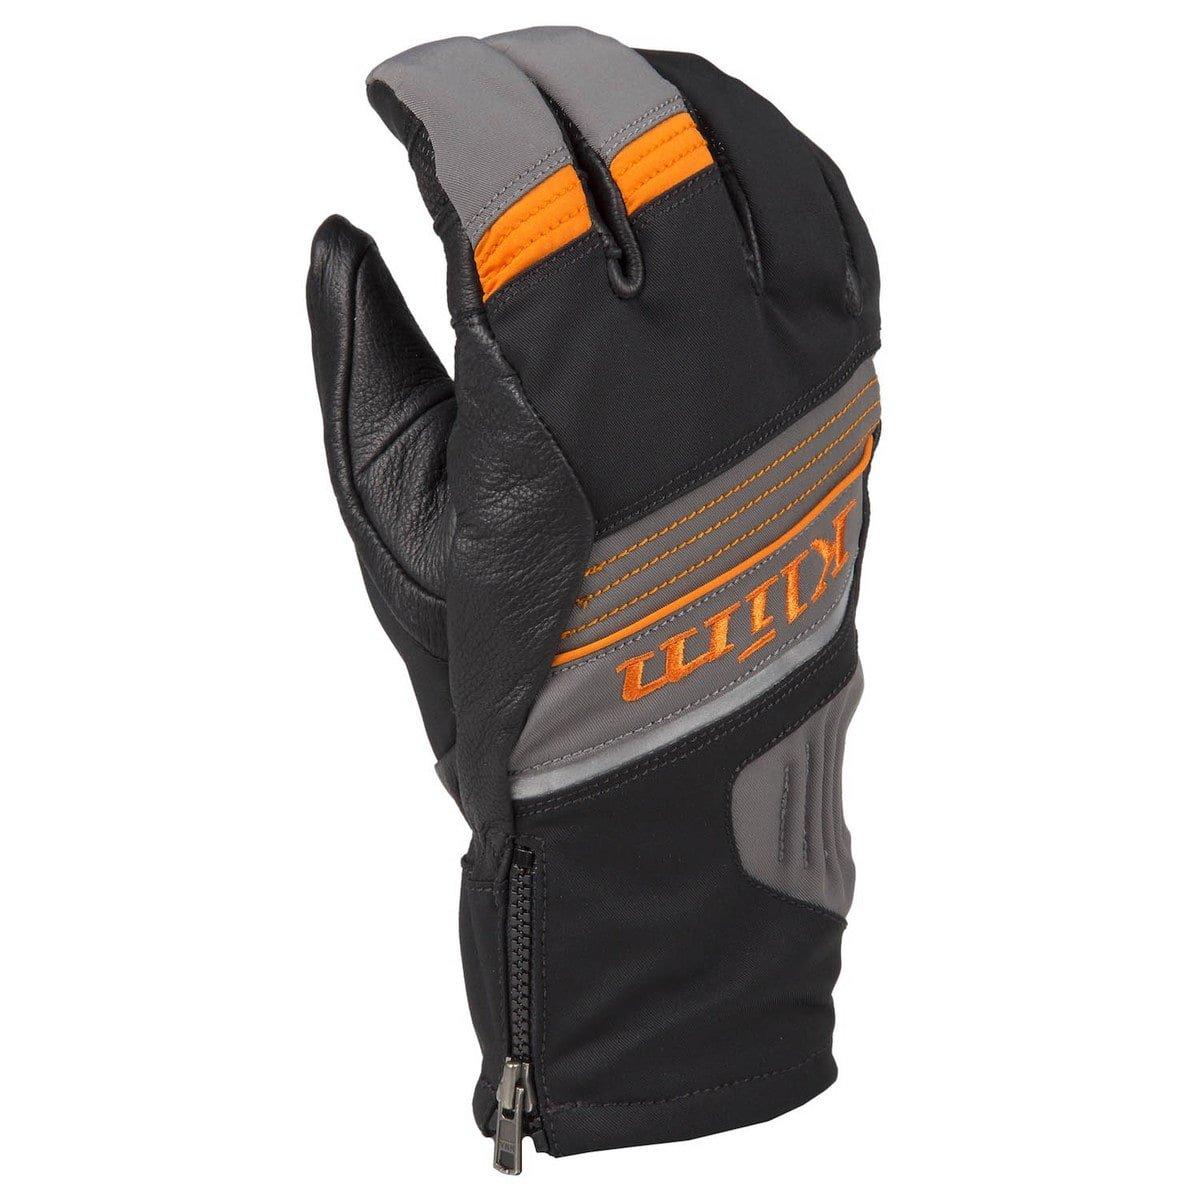 Klim Powerxross Men's Ski Snowmobile Gloves - Dark Gray/Orange / Medium